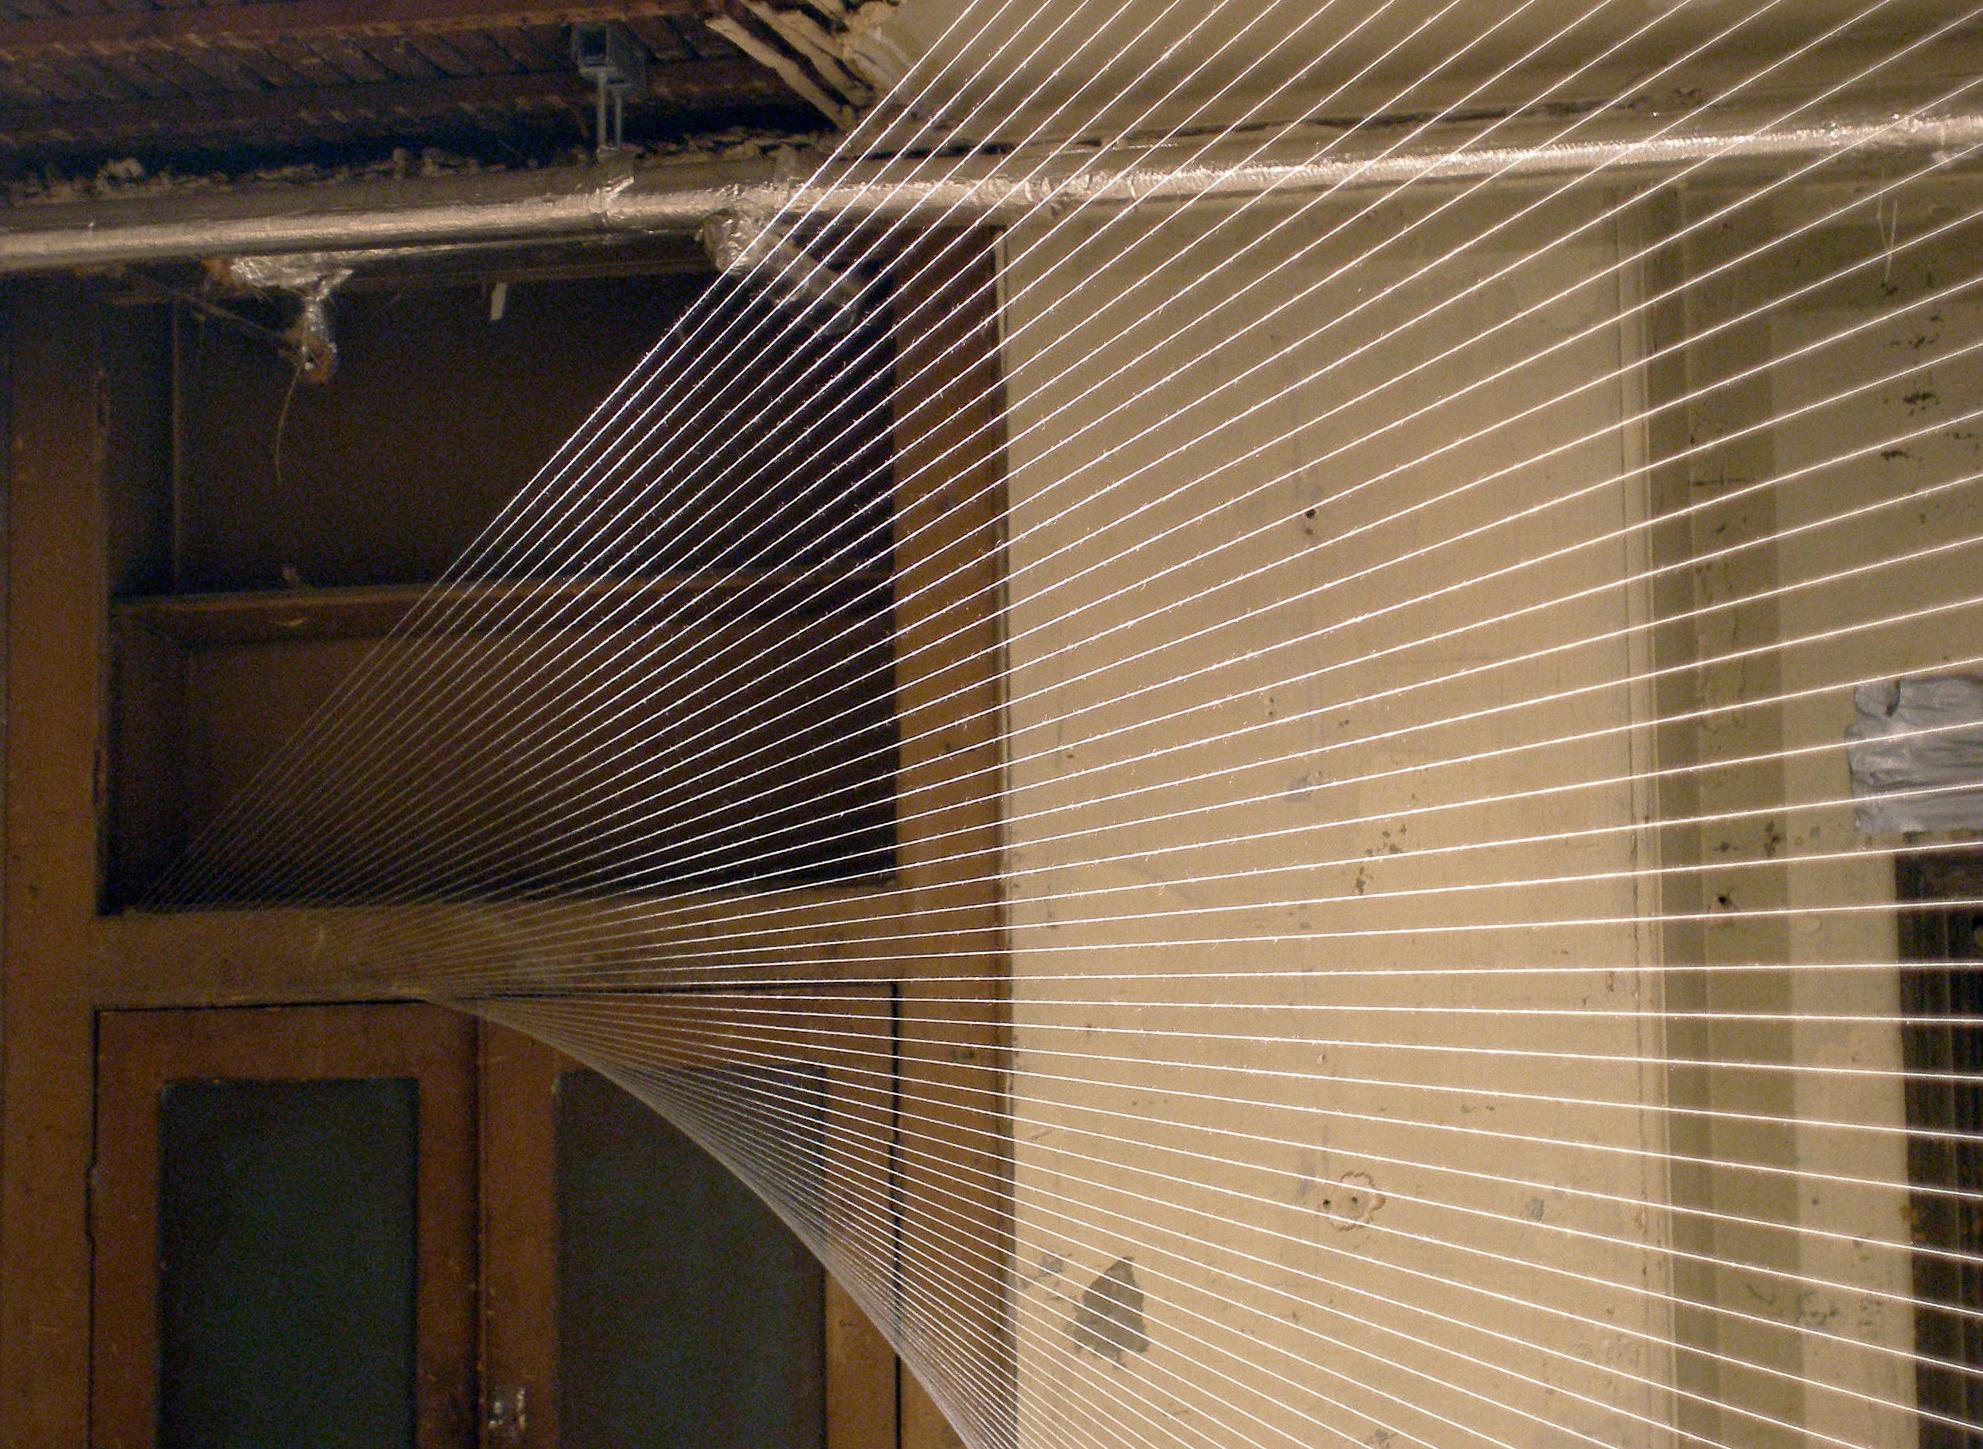 Kate_Terry-thread-installation-19-three.jpg